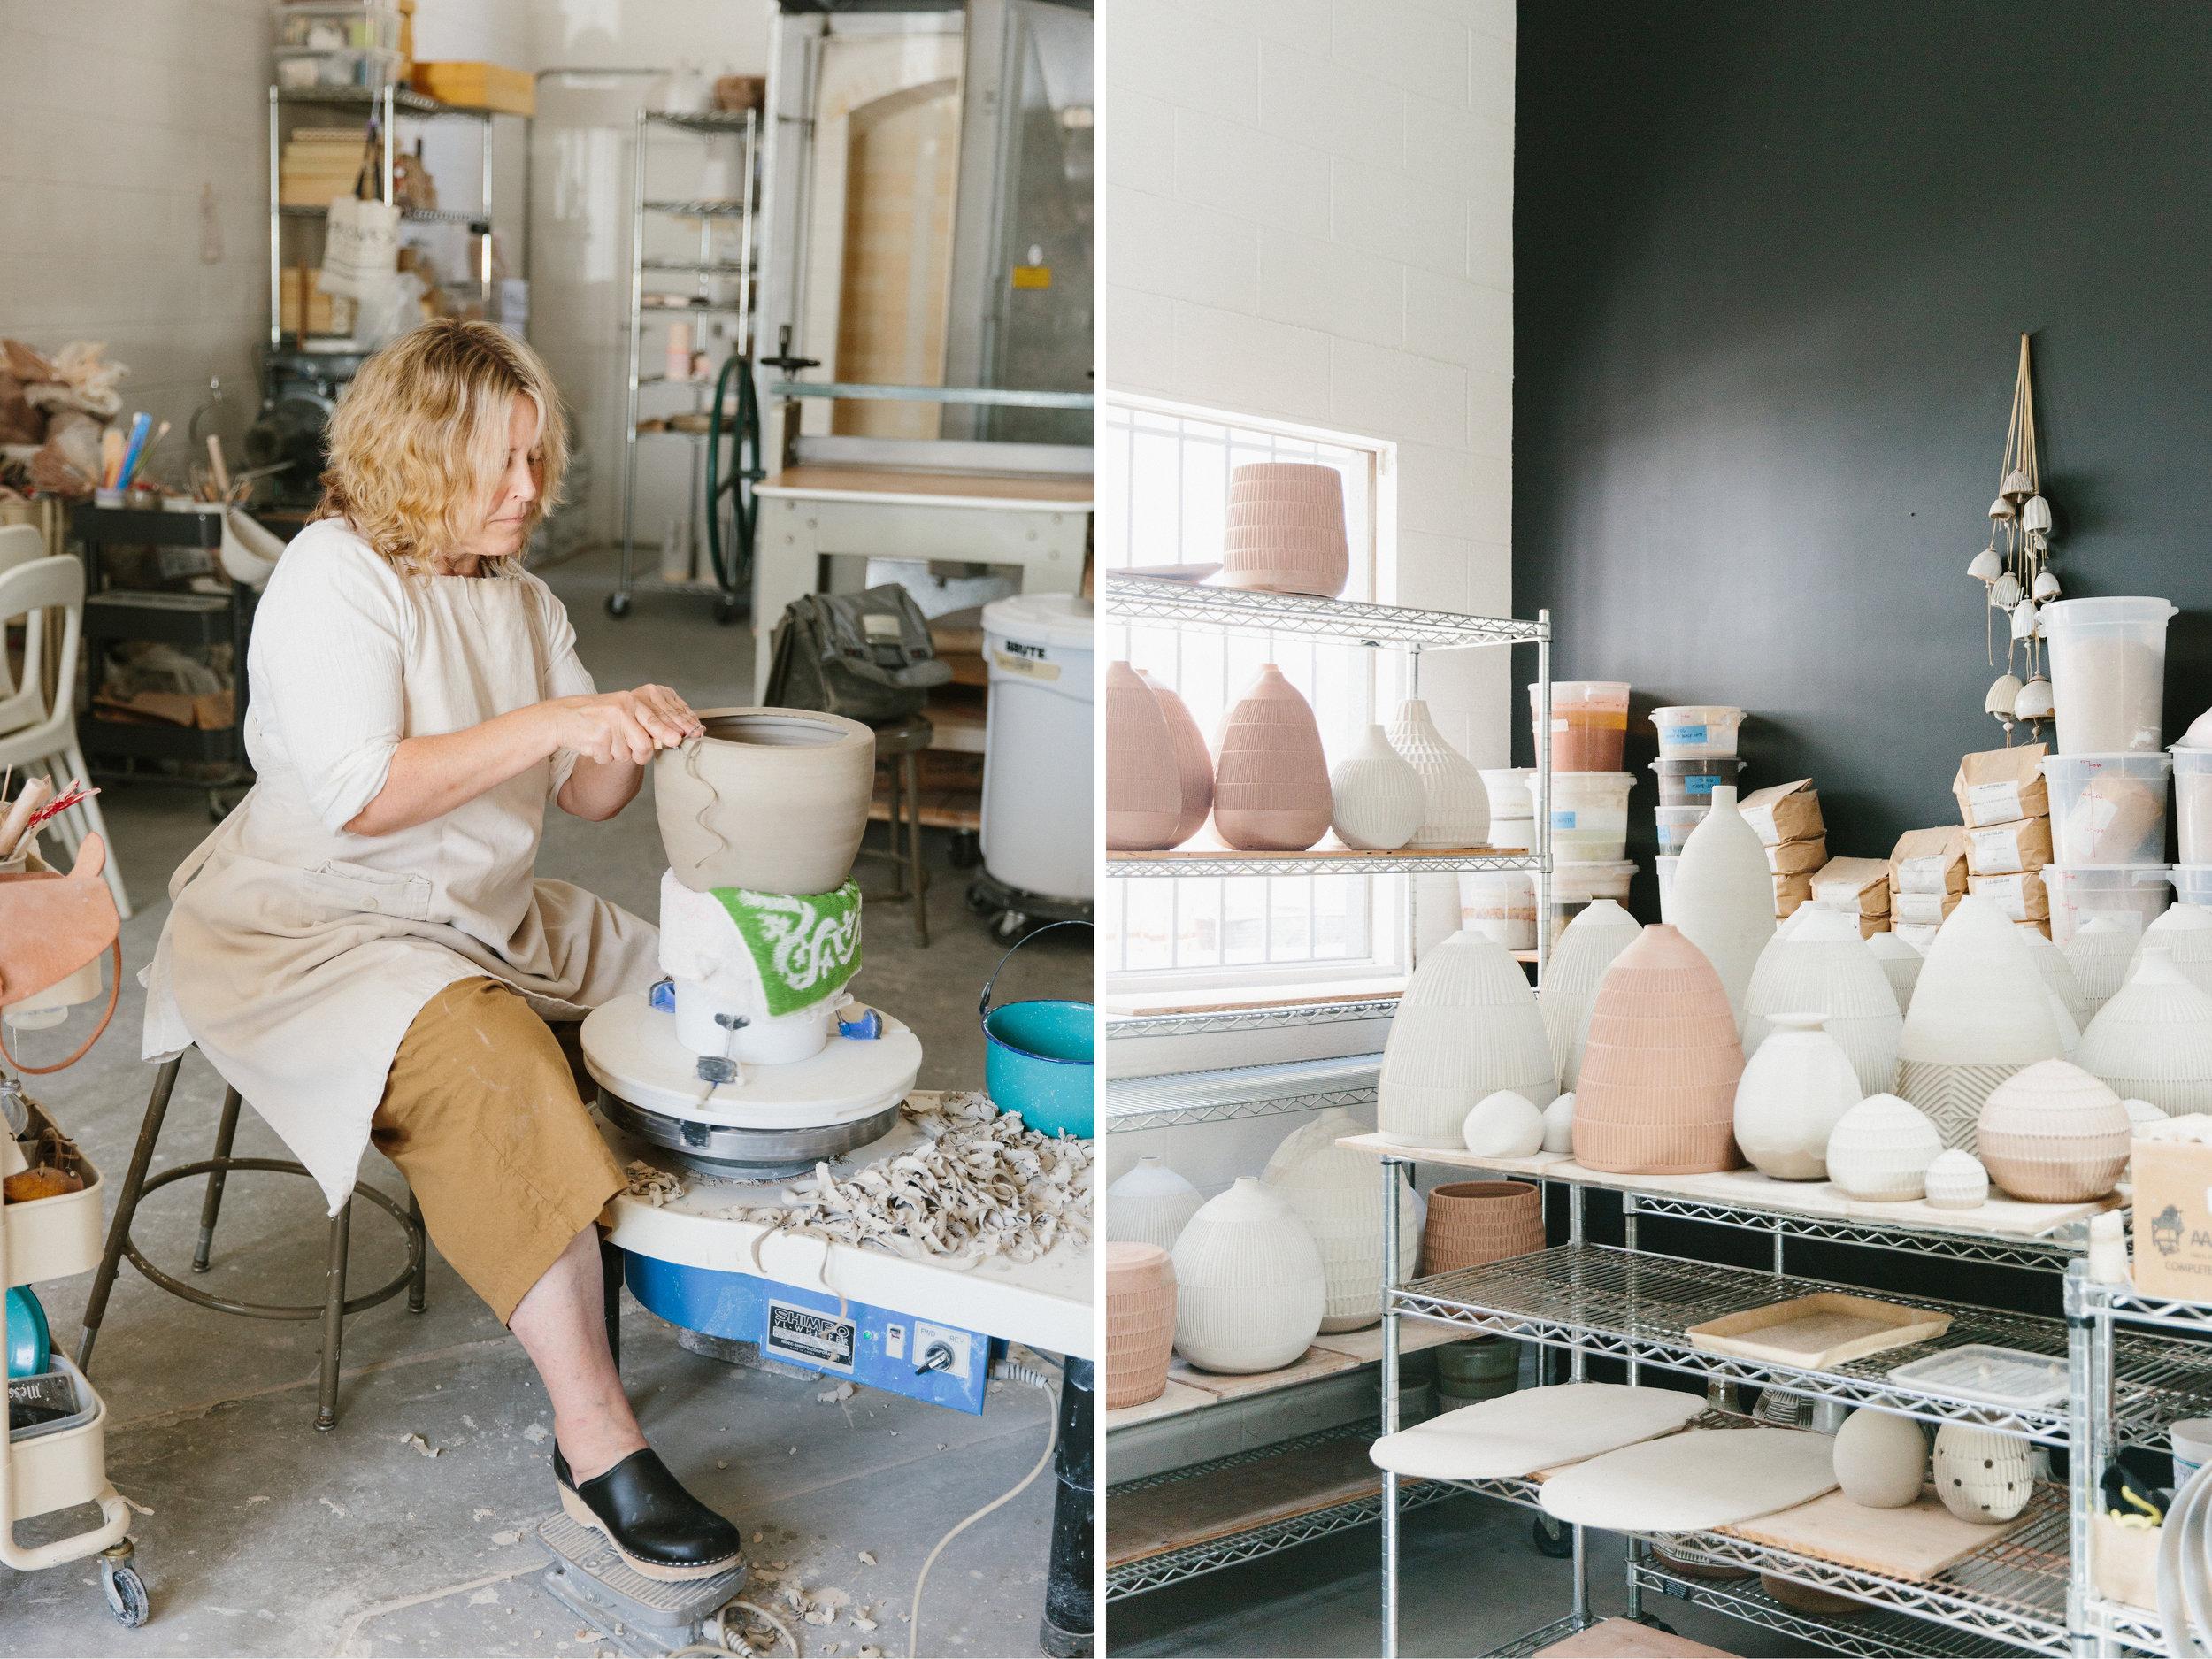 mt-washington-pottery_jenni-kayne_los-angeles-editorial-studio-home-tour_nicki-sebastian_6.jpg